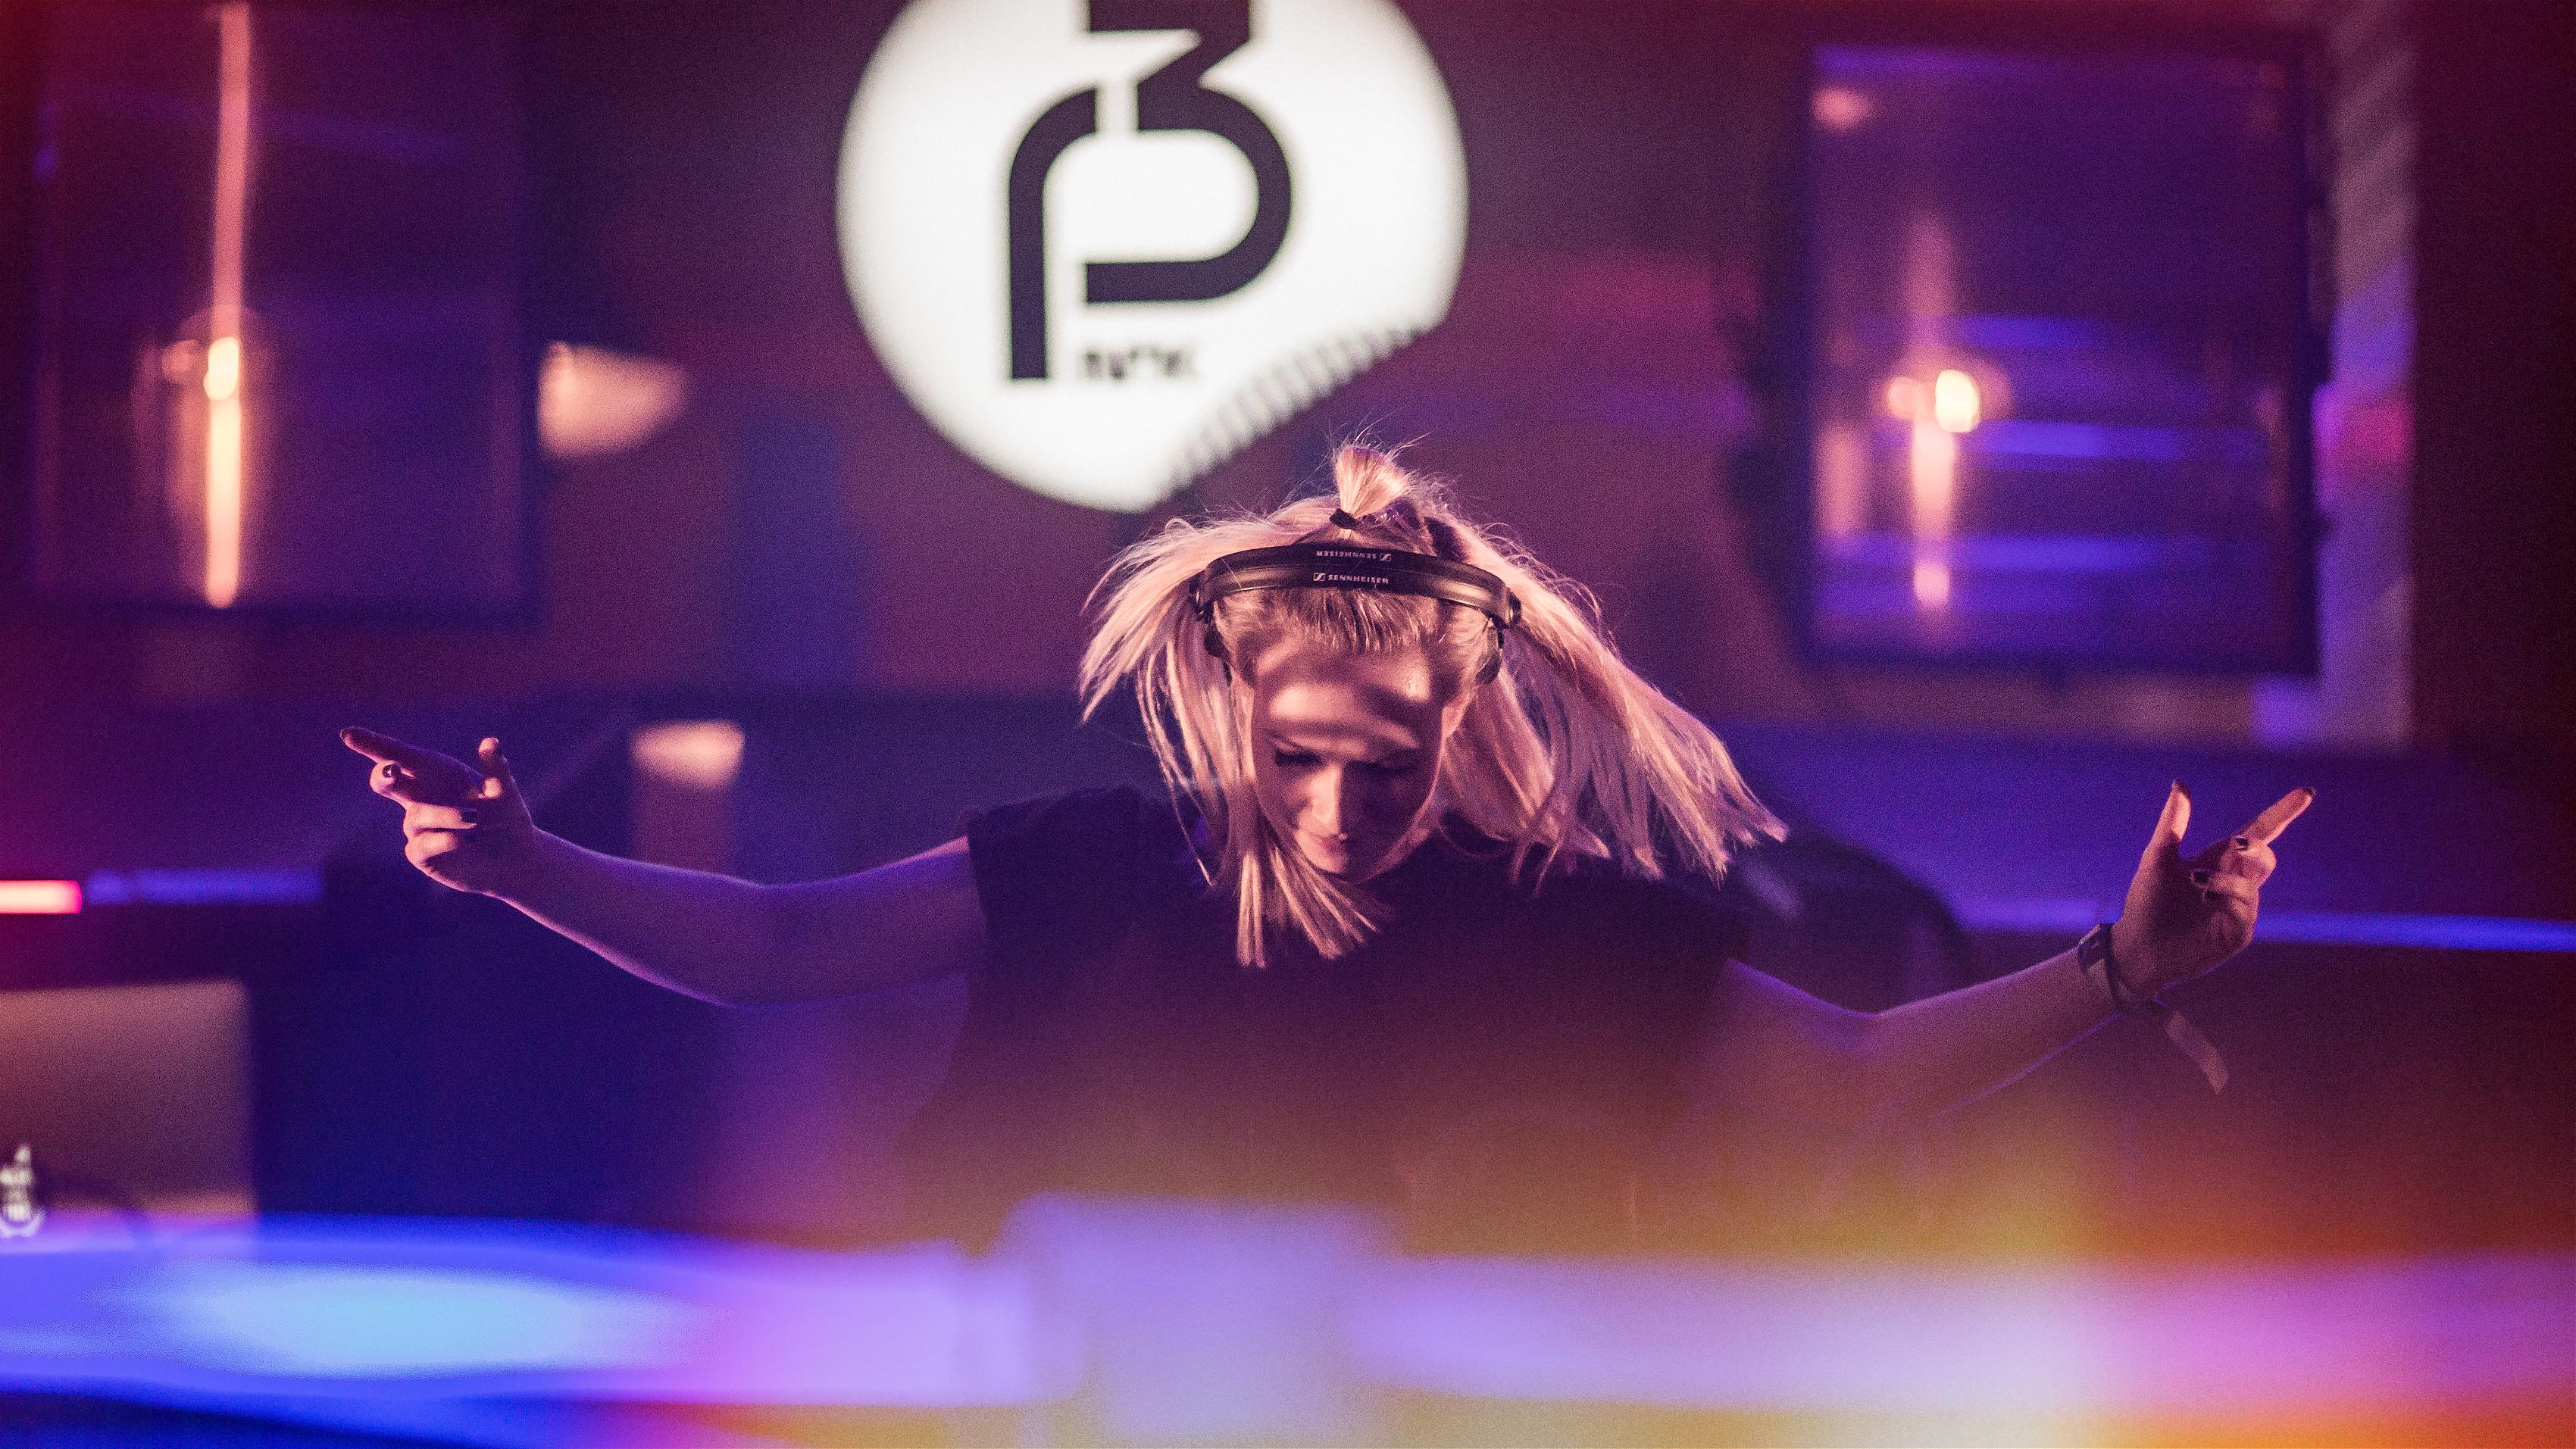 Christine Dancke // P3 Klubb